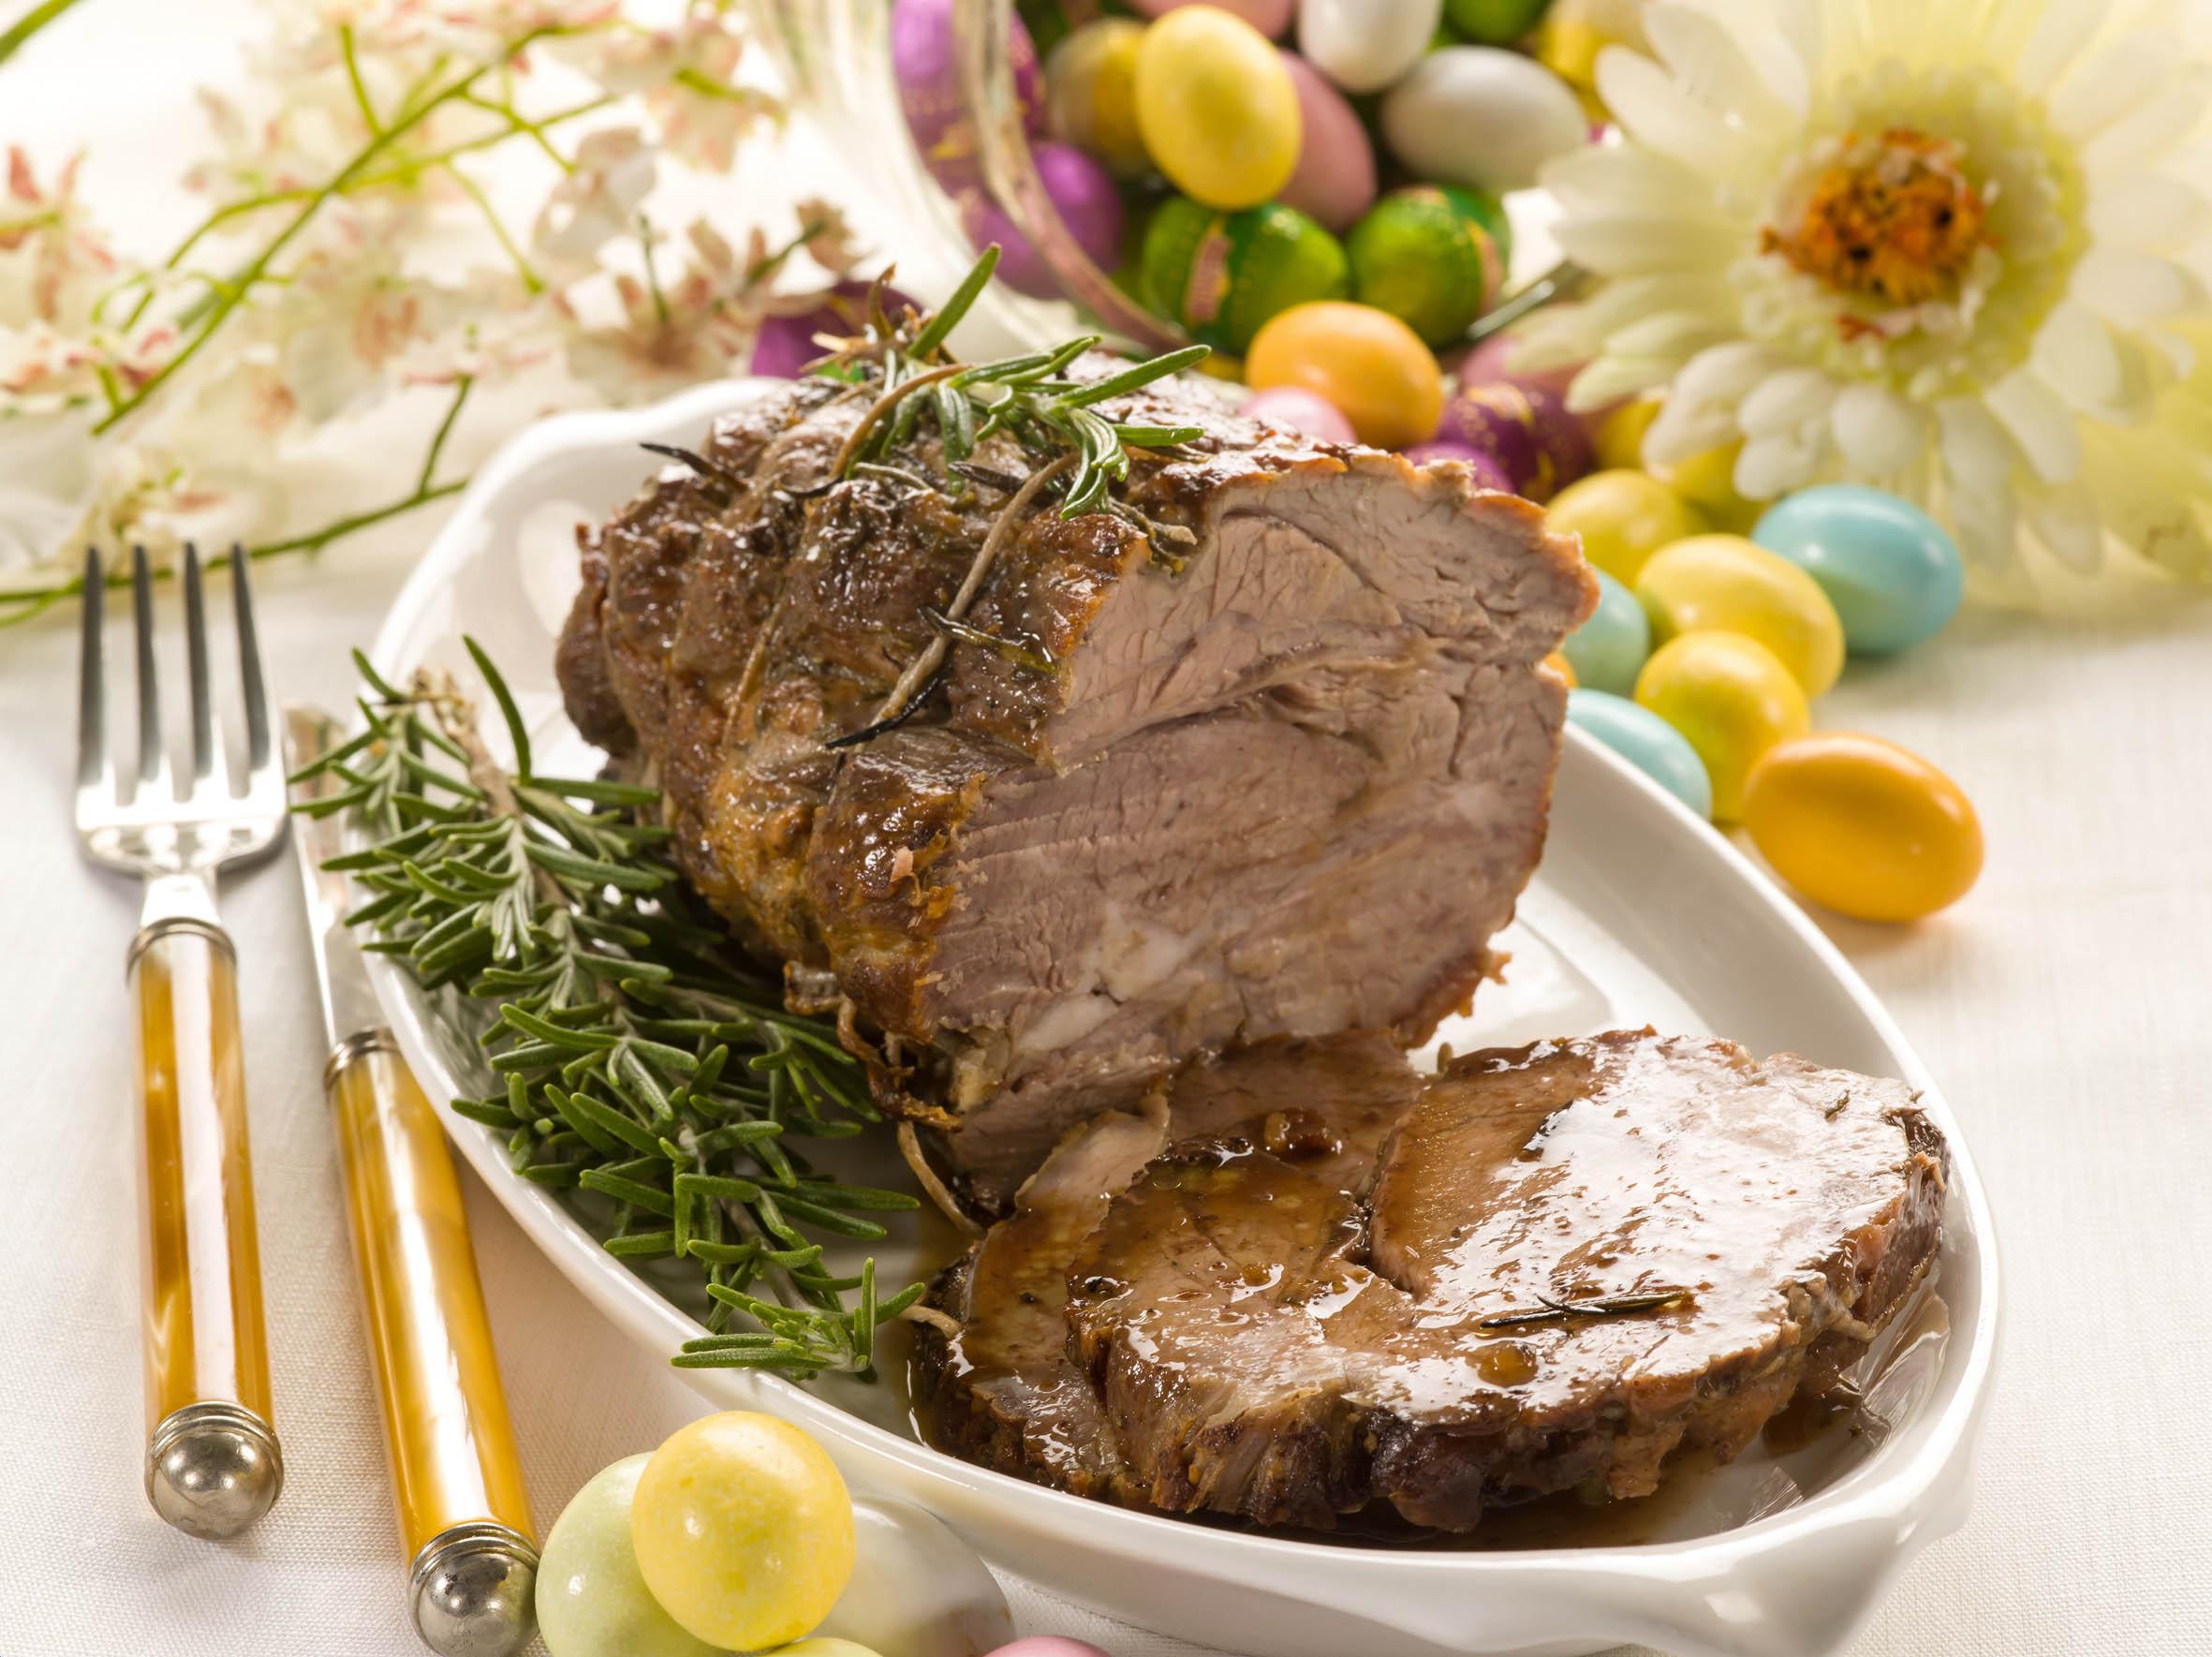 Easter celebration at intercontinental bali resort for Food for easter dinner